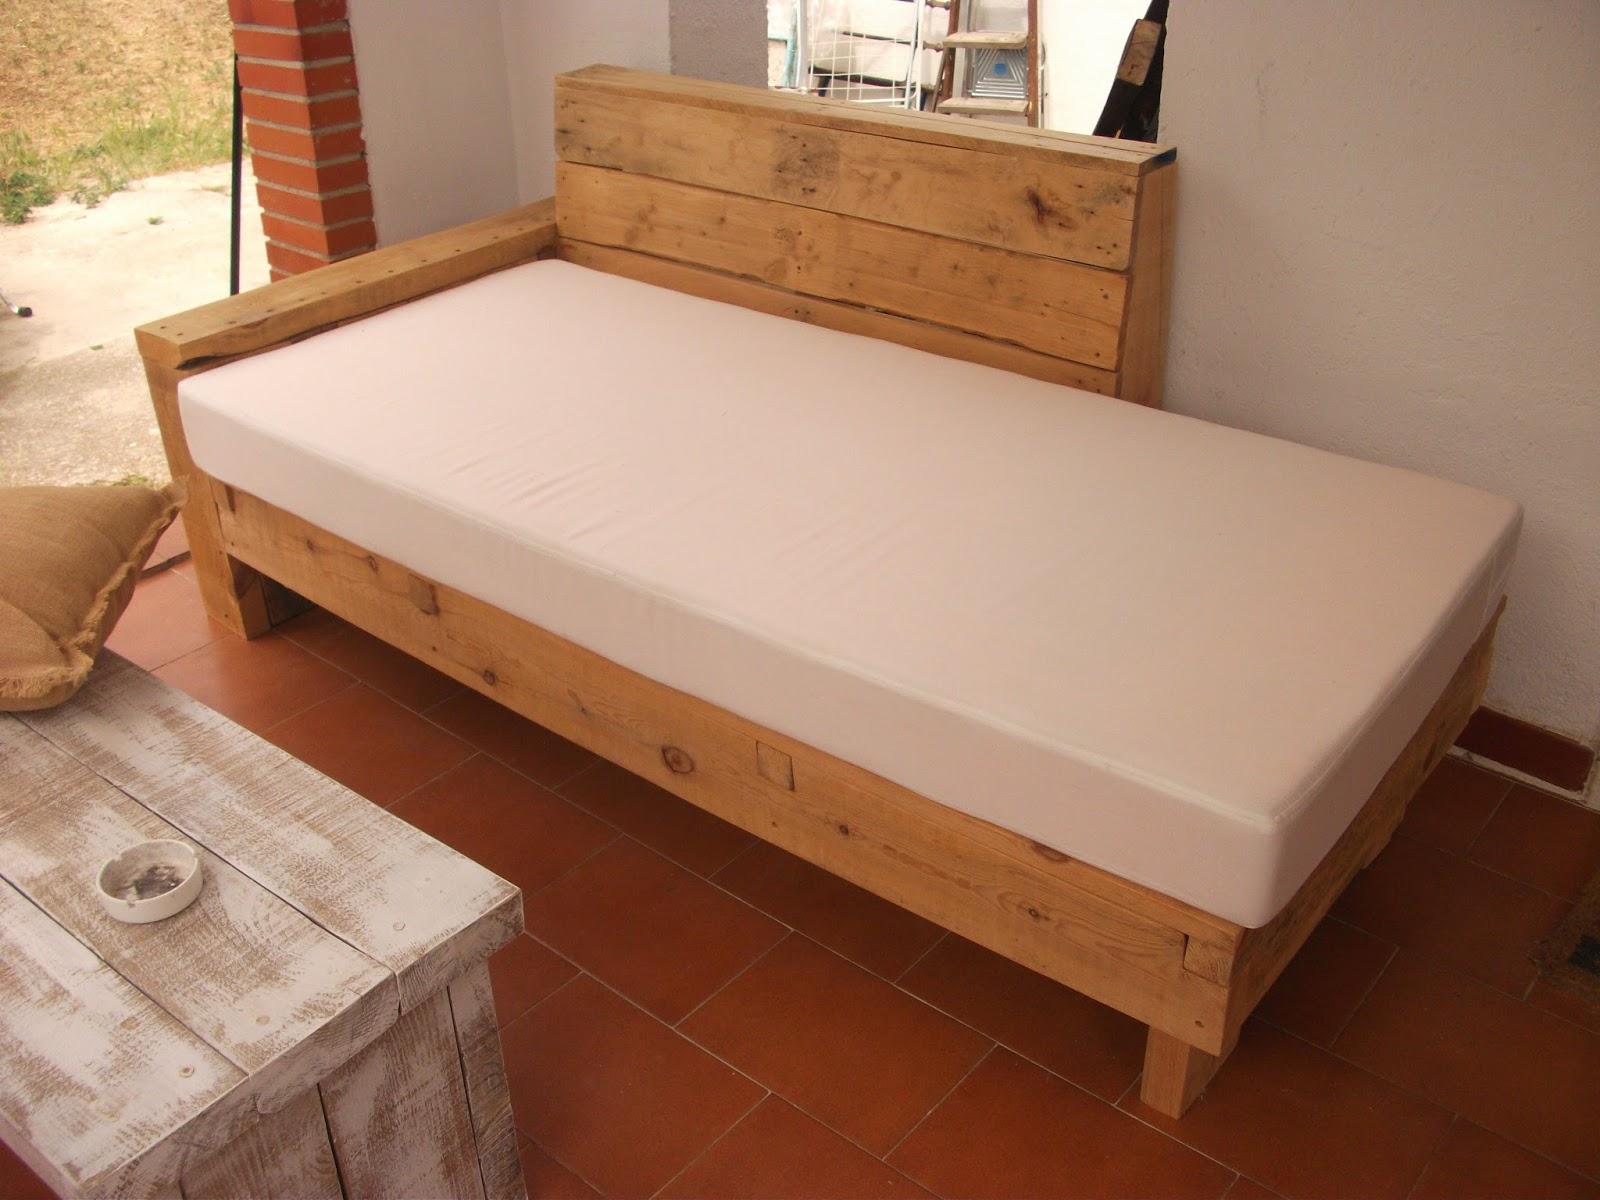 Renovarte con palets cama balinesa tatami banco balines - Base cama almacenaje ...